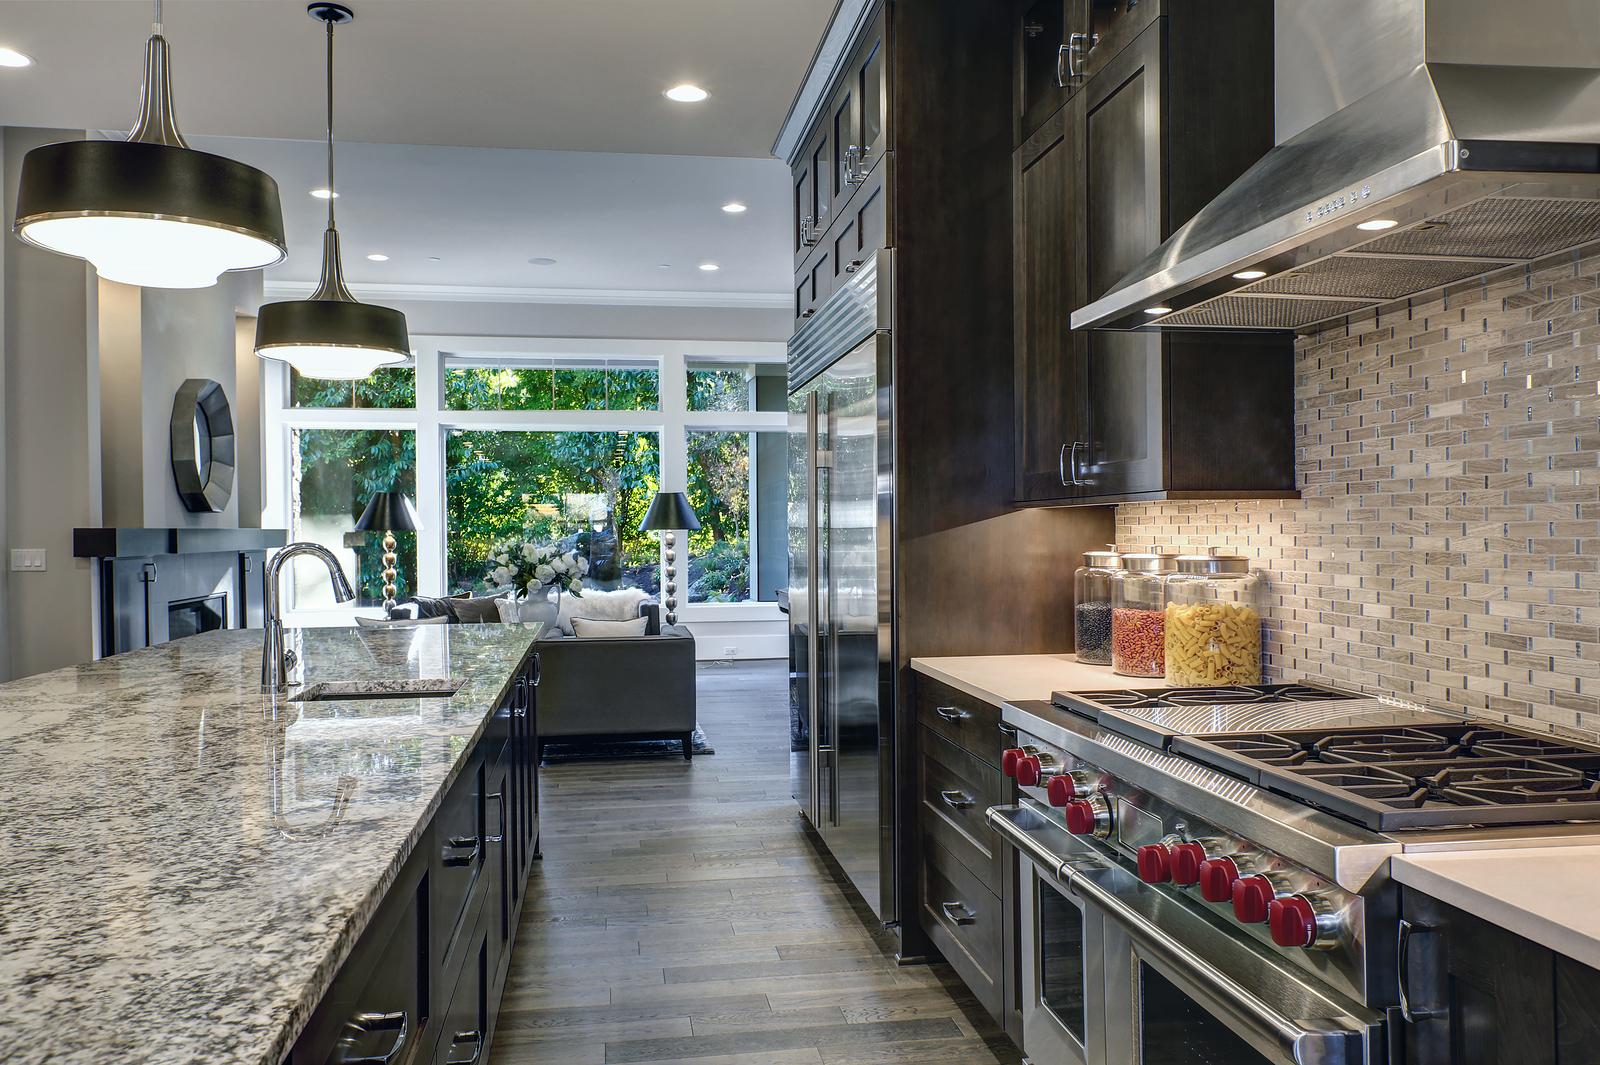 Modern kitchen with brown kitchen cabinets, oversized kitchen island with bar stools, granite countertops, huge refrigerator and beige backsplash. Northwest, USA